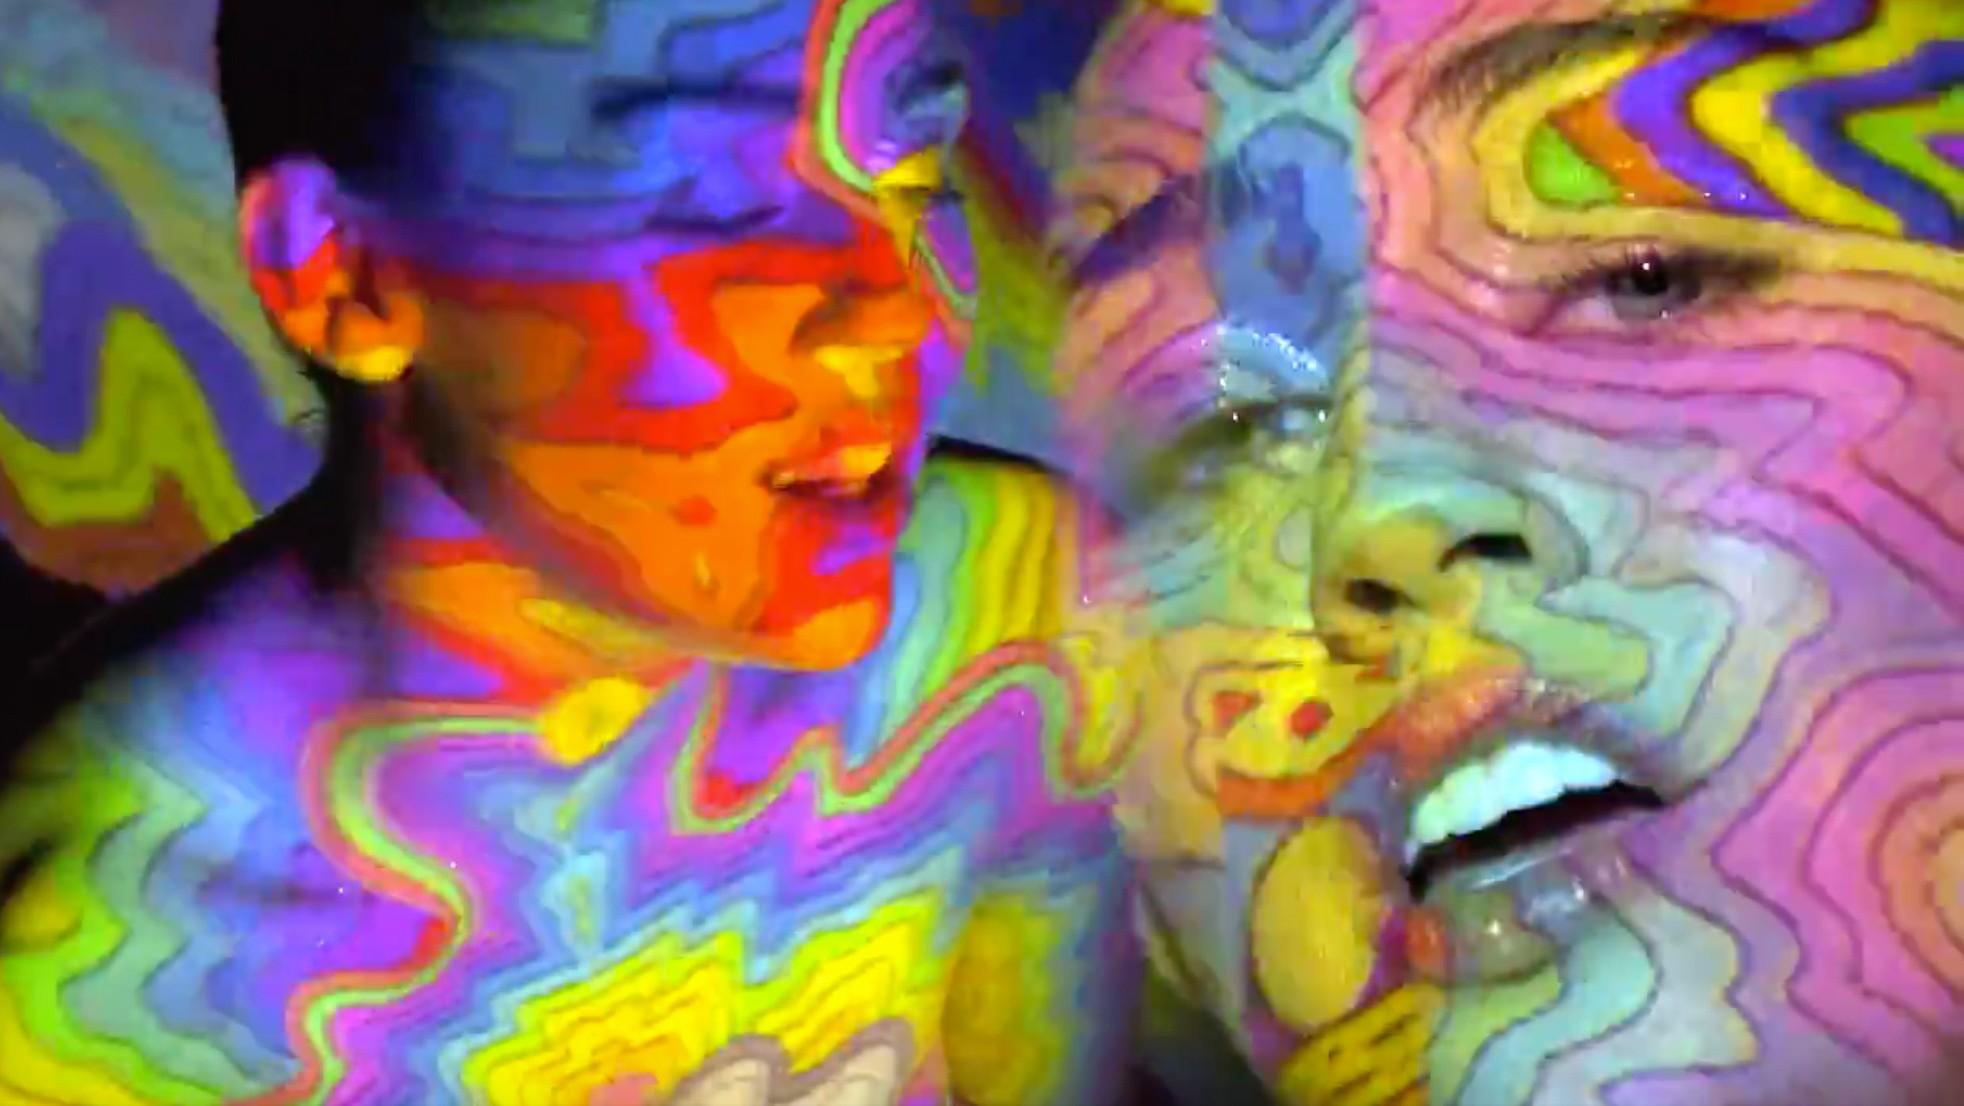 Miley Cyrus video kaleidoscópico para 'Lighter'